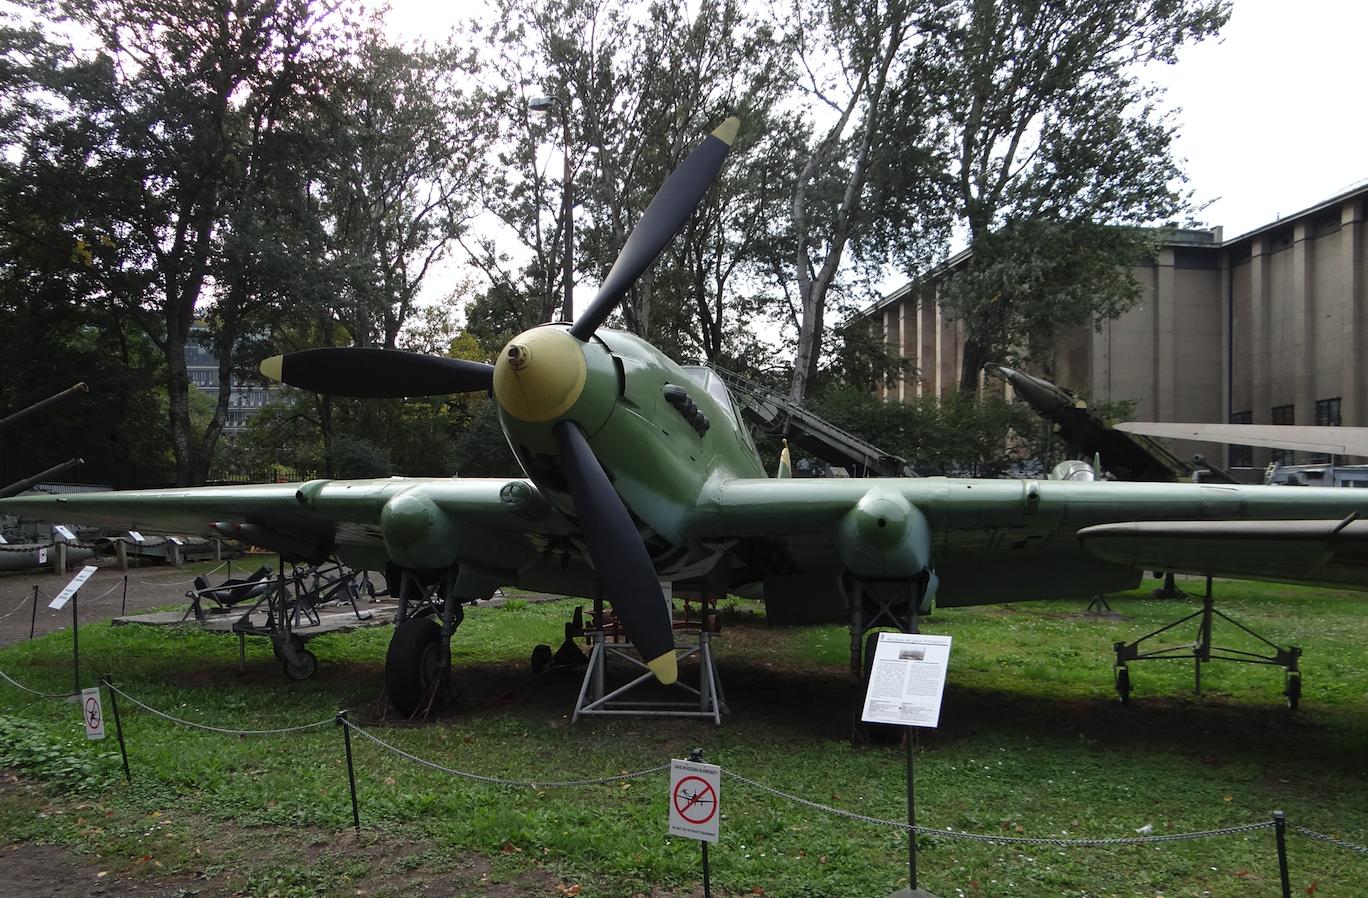 The Il-2 attack aircraft. 2012 year. Photo by Karol Placha Hetman